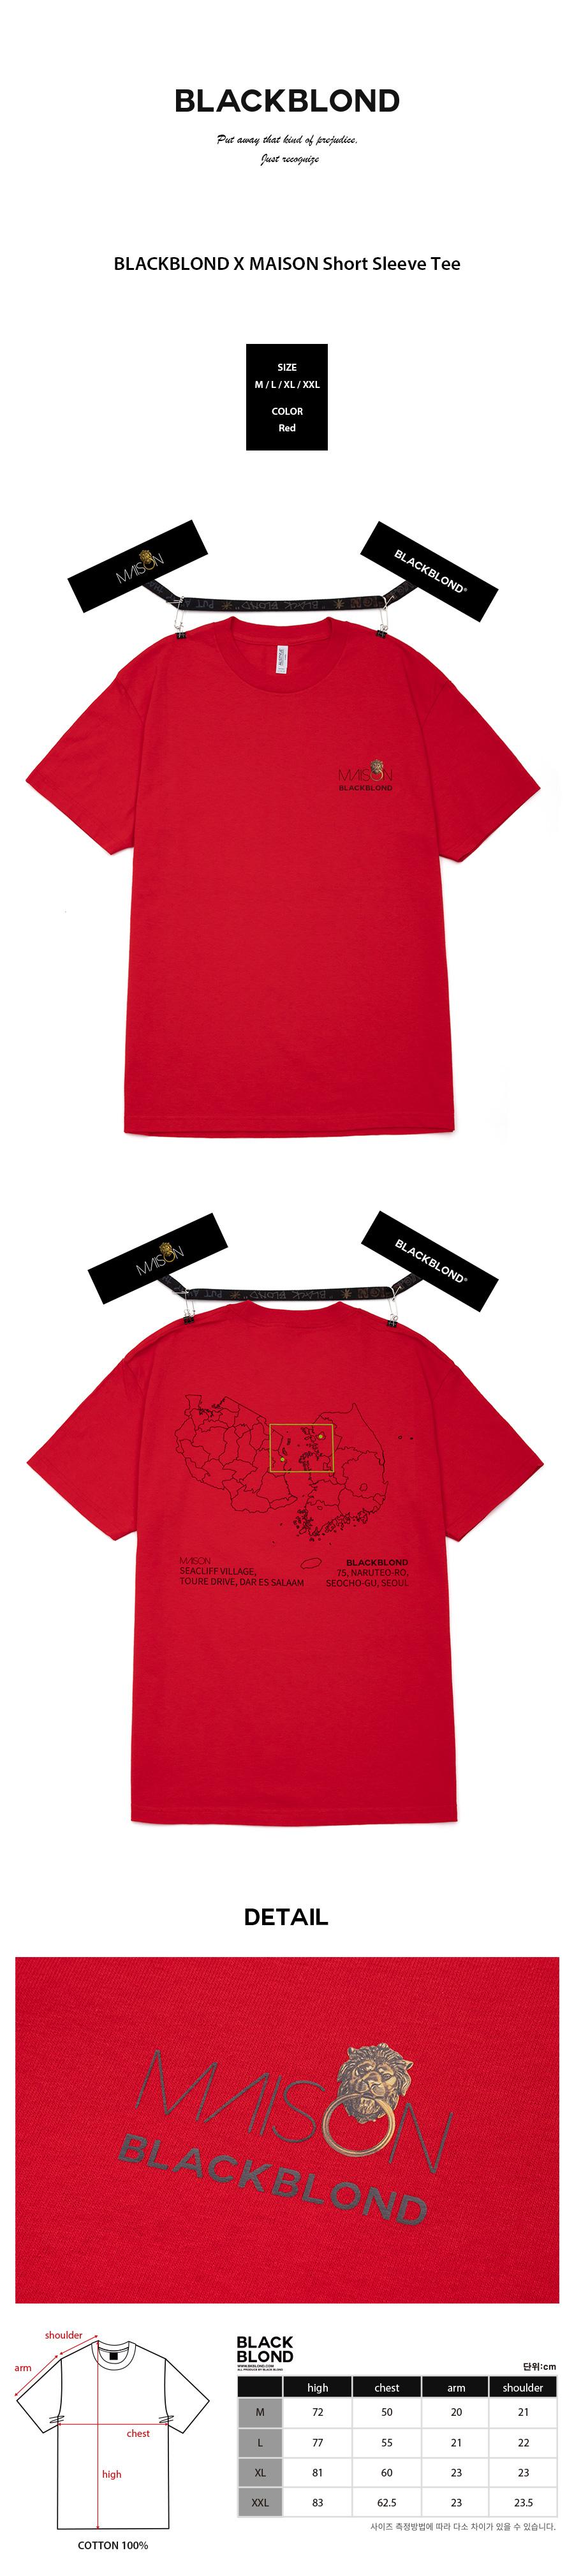 BLACKBLOND - BLACKBLOND x MAISON Short Sleeve Tee (Red)